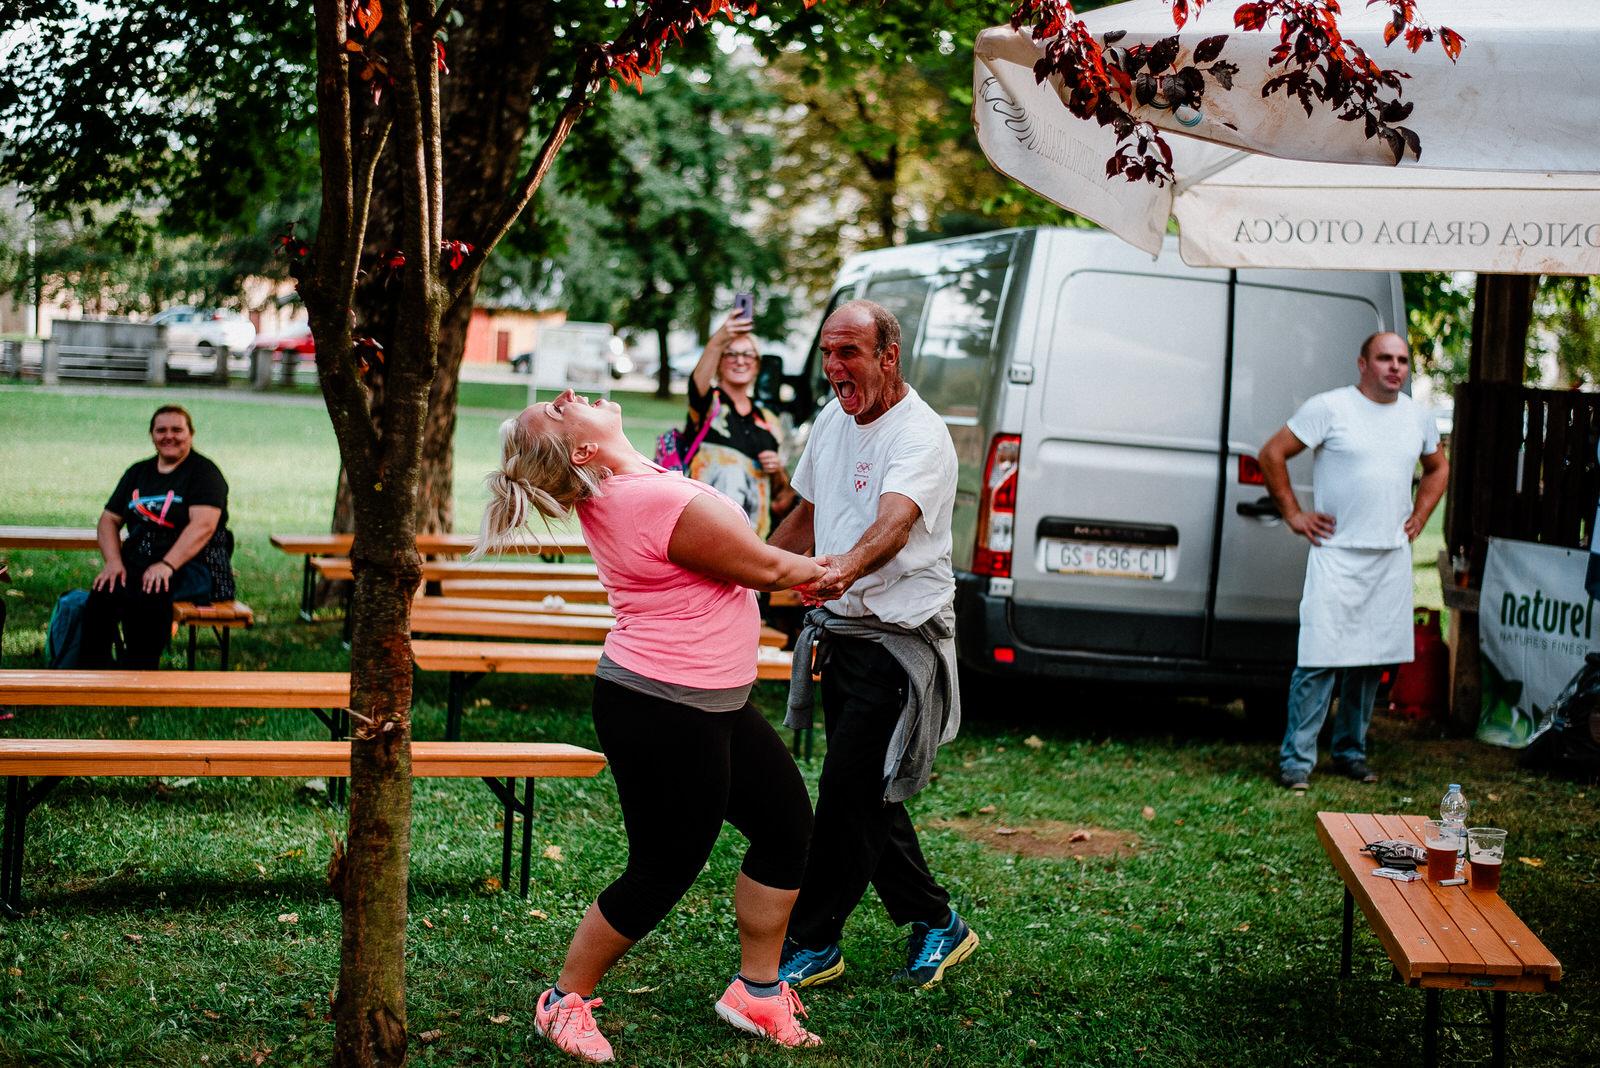 likaclub_otočac_hrvatski-festival-hodanja_2019-15